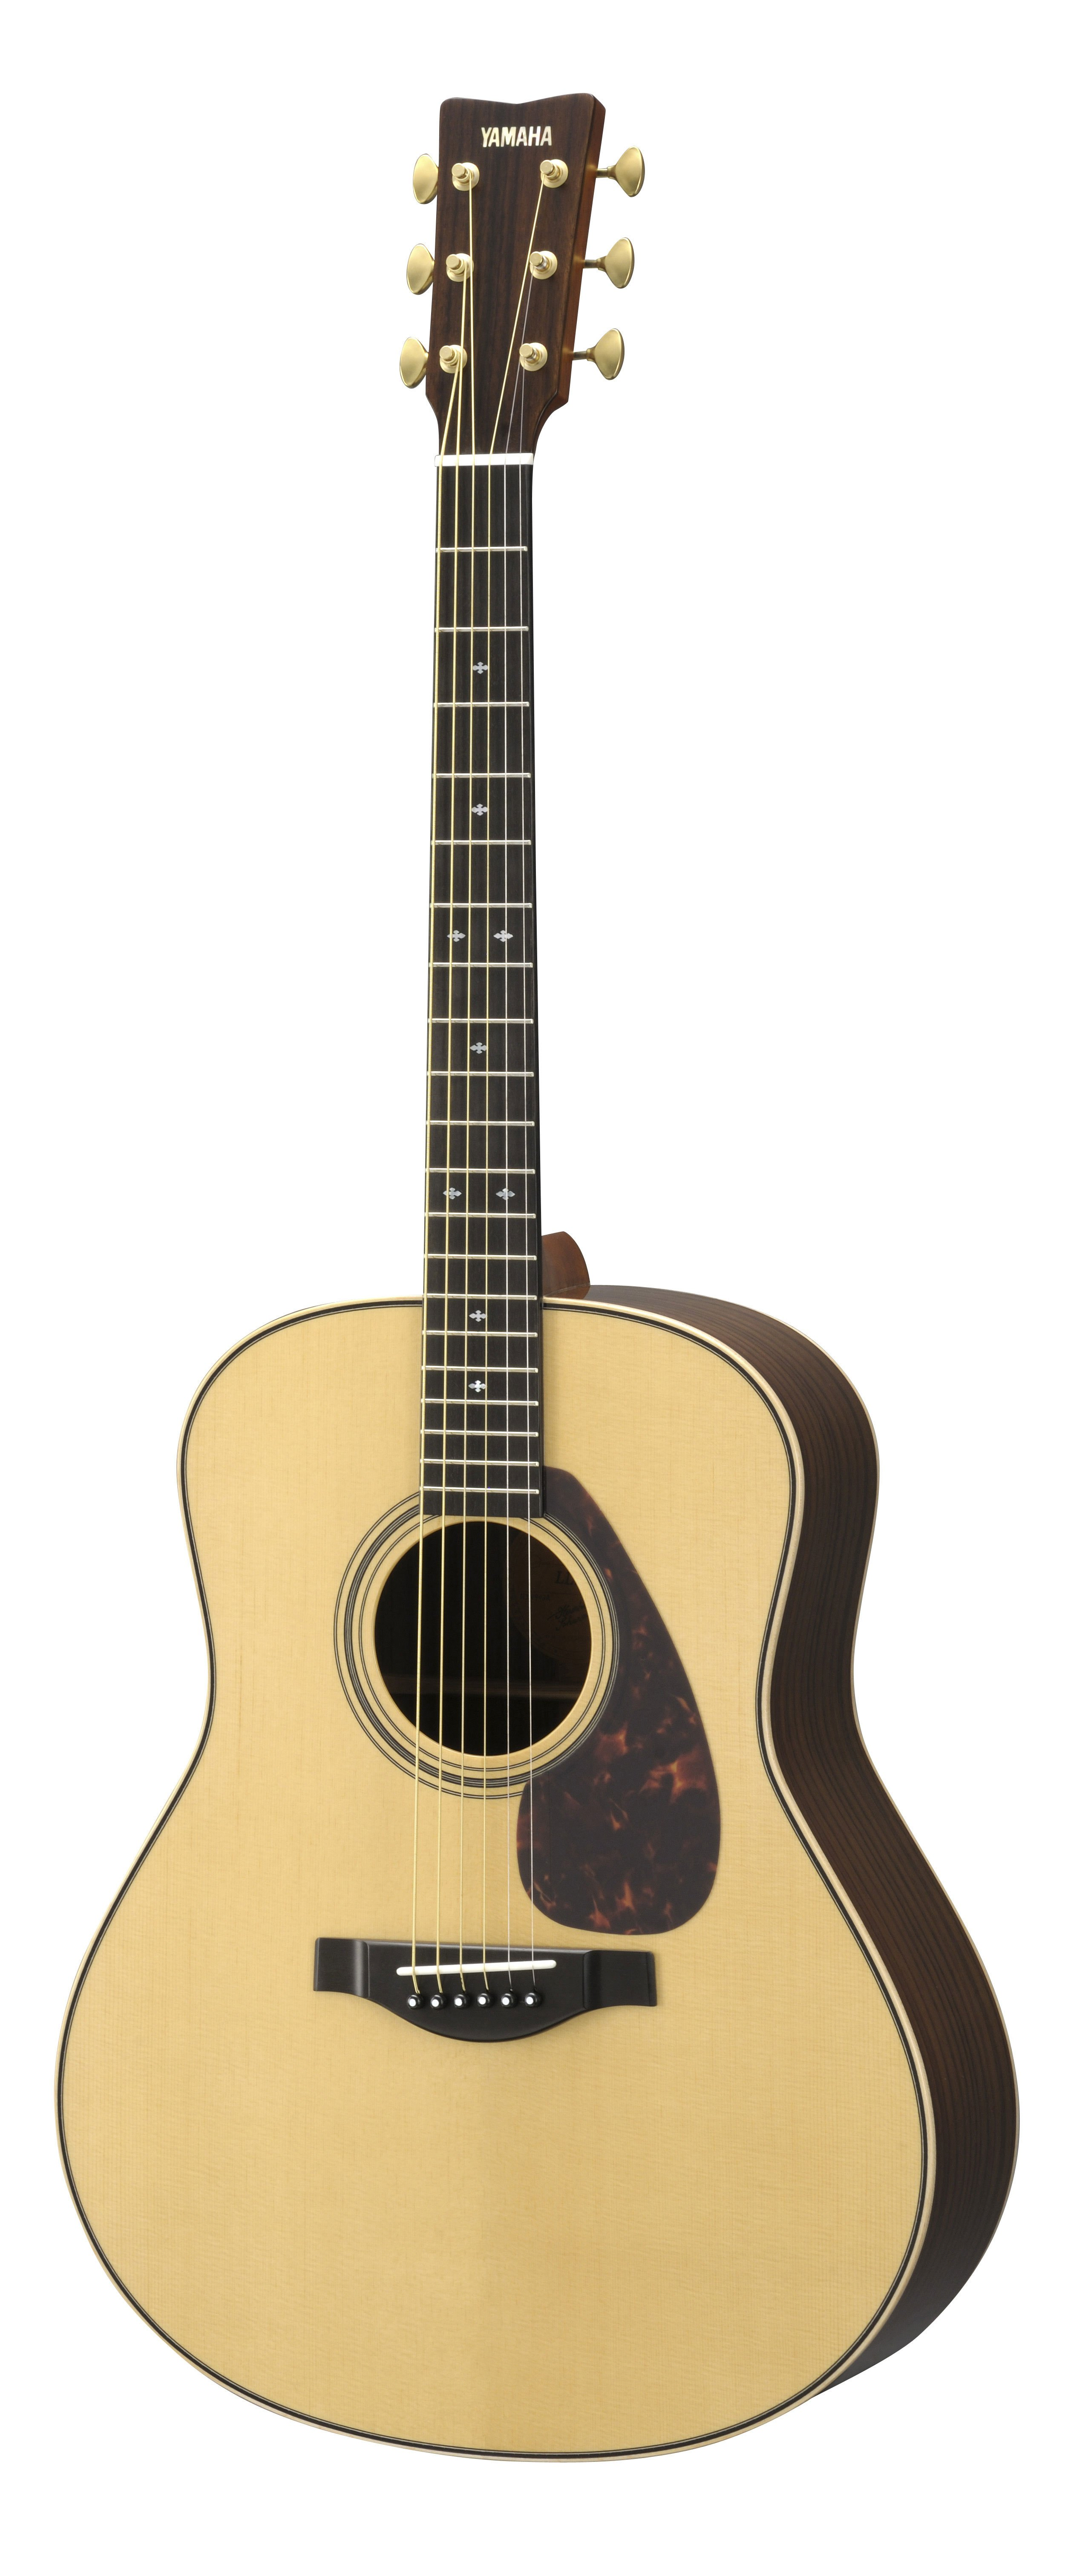 L series ll series acoustic guitars guitars basses for Yamaha series a